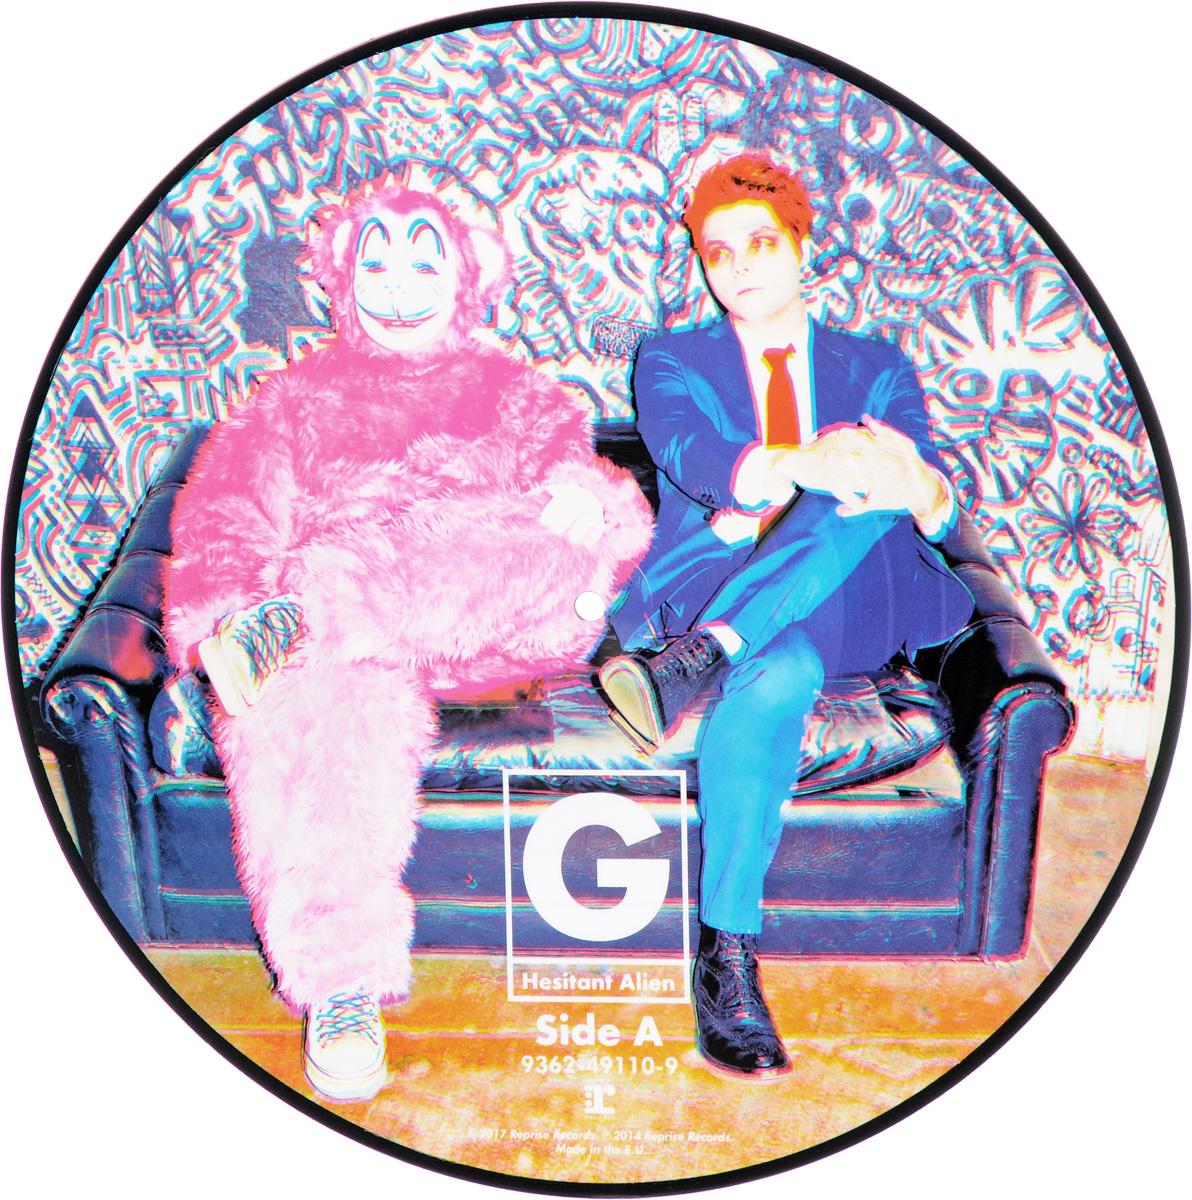 Джерард Уэй Gerard Way. Hesitant Alien. Picture Vinyl (LP) gerard way gerard way zero zero television all the time